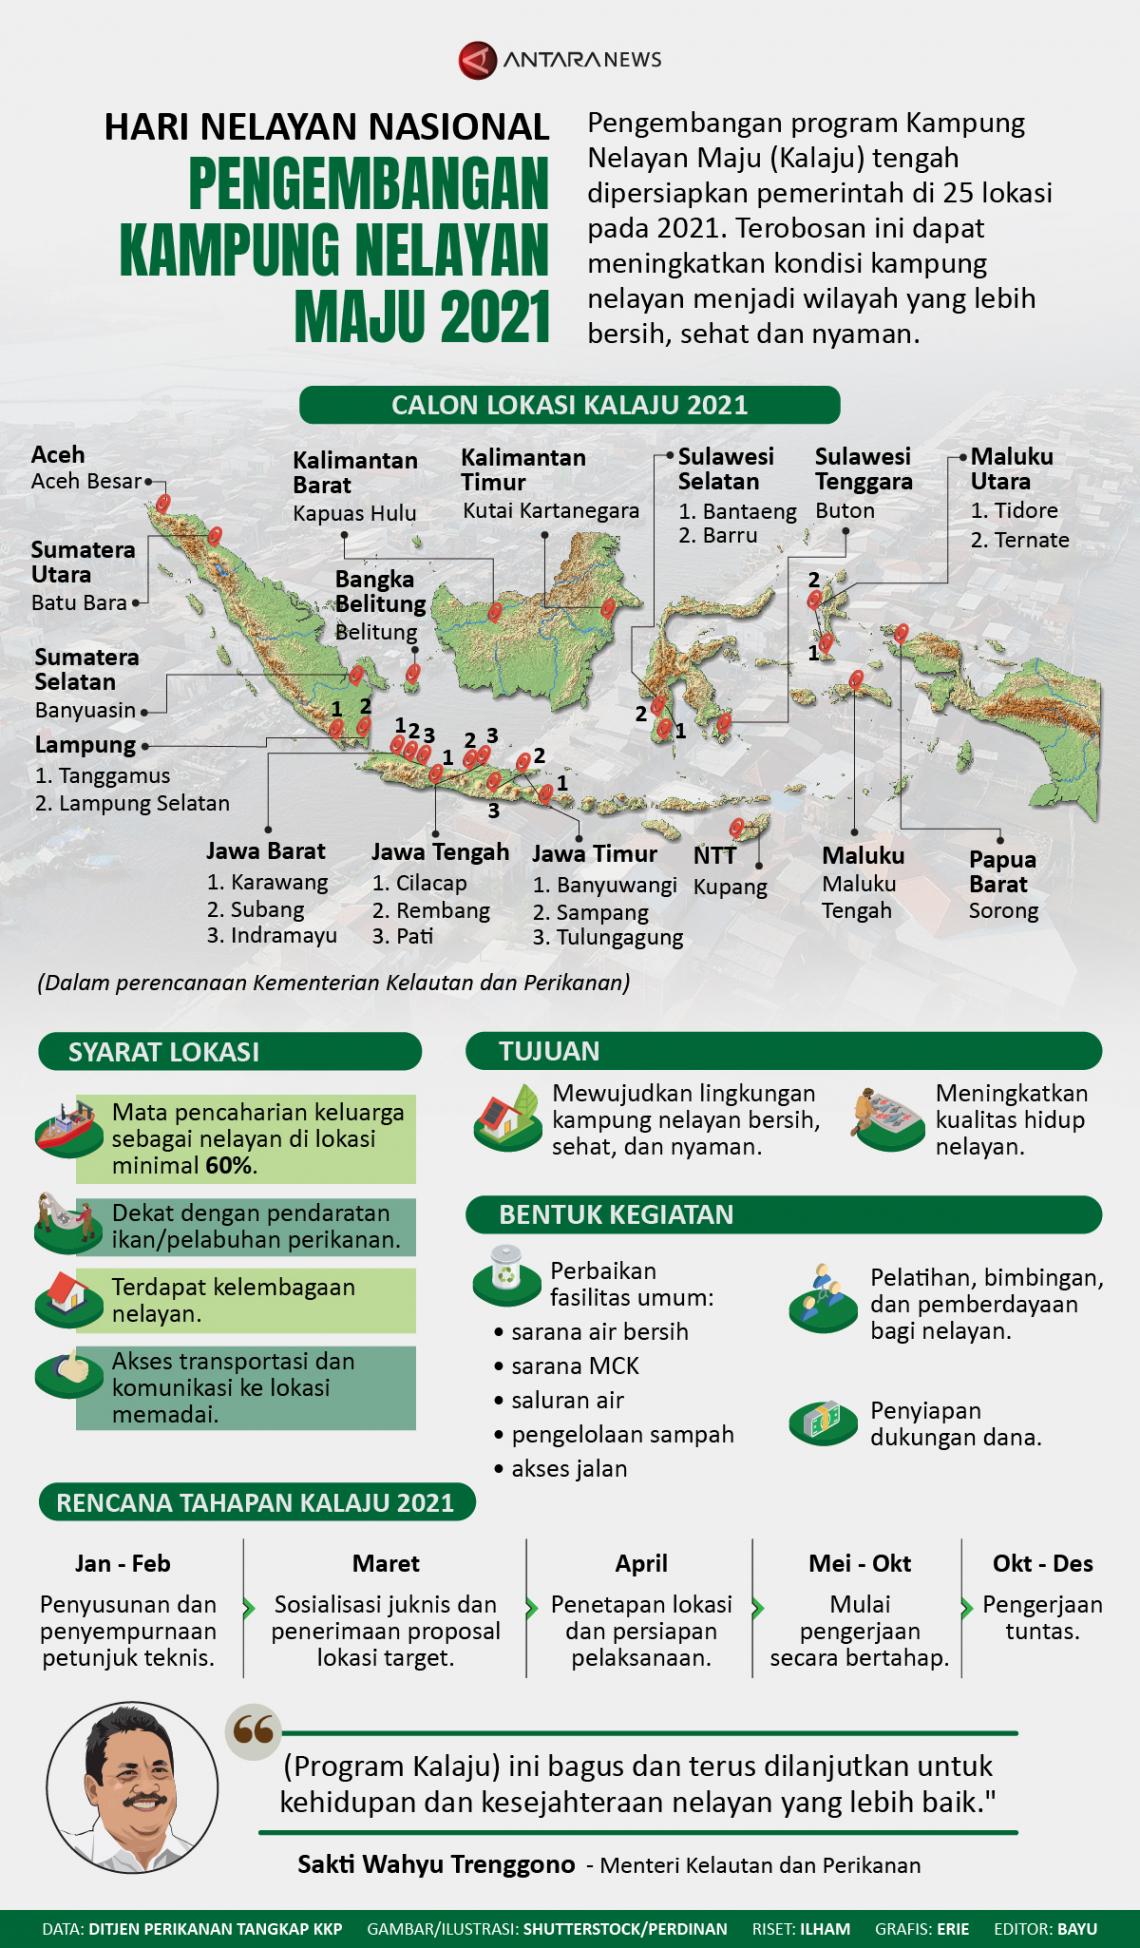 Pengembangan Kampung Nelayan Maju 2021